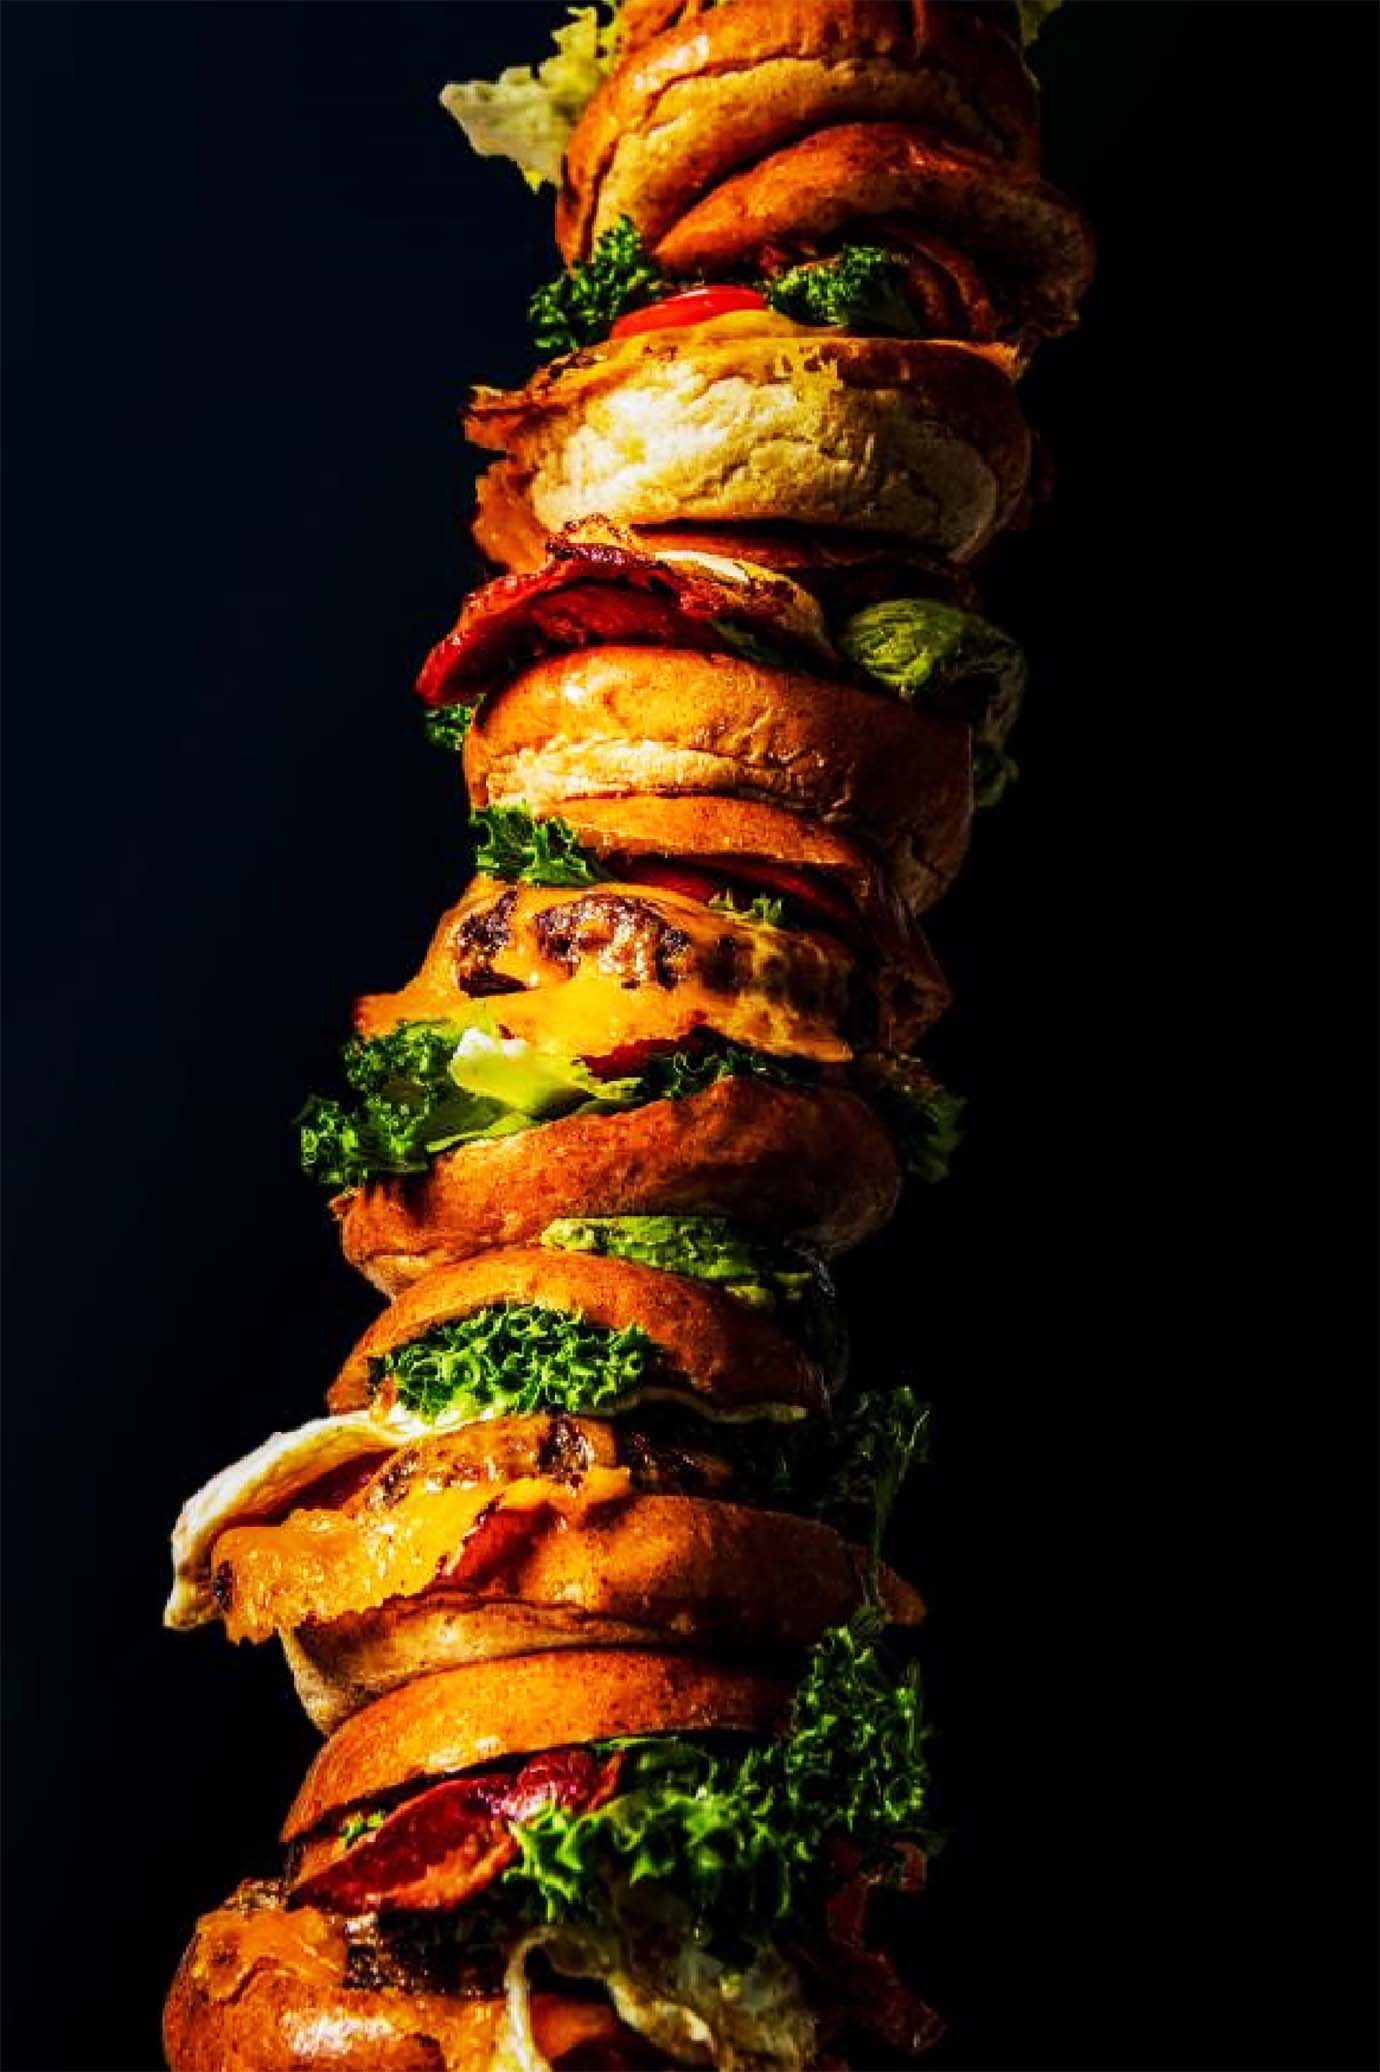 ishigamaya-goku-burger